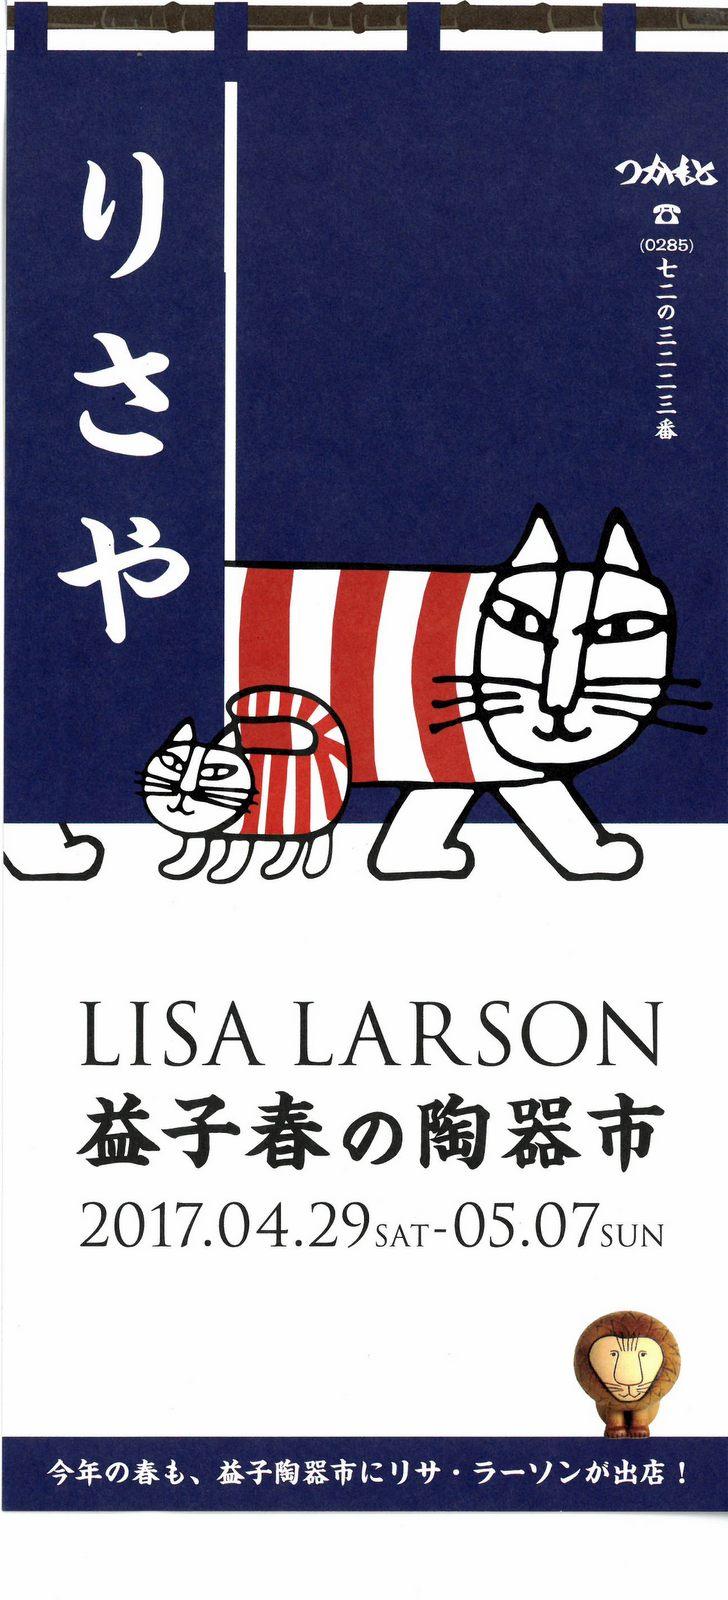 LISALARSON益子春の陶器市